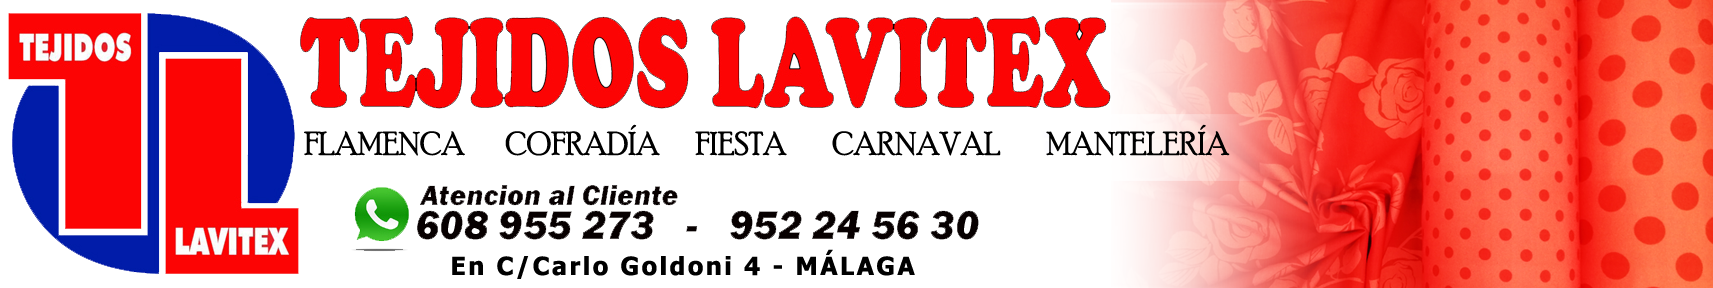 Tejidos Lavitex, SL.